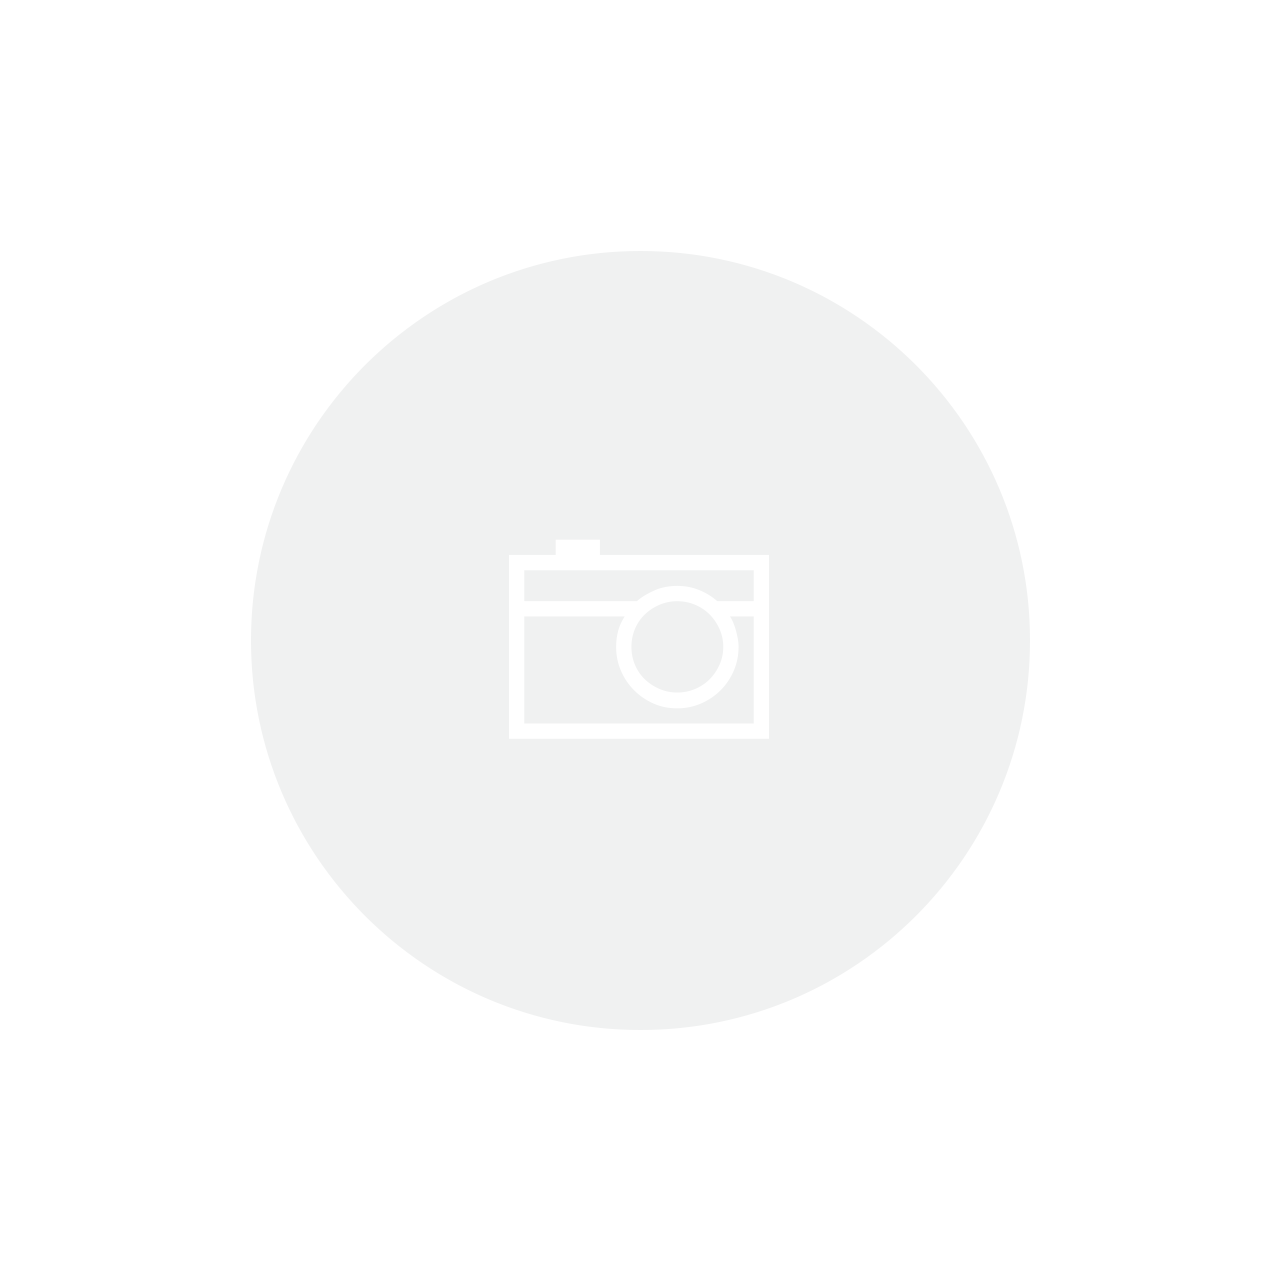 Castelli Del Grevepesa Chianti Classico Castelgreve 2015